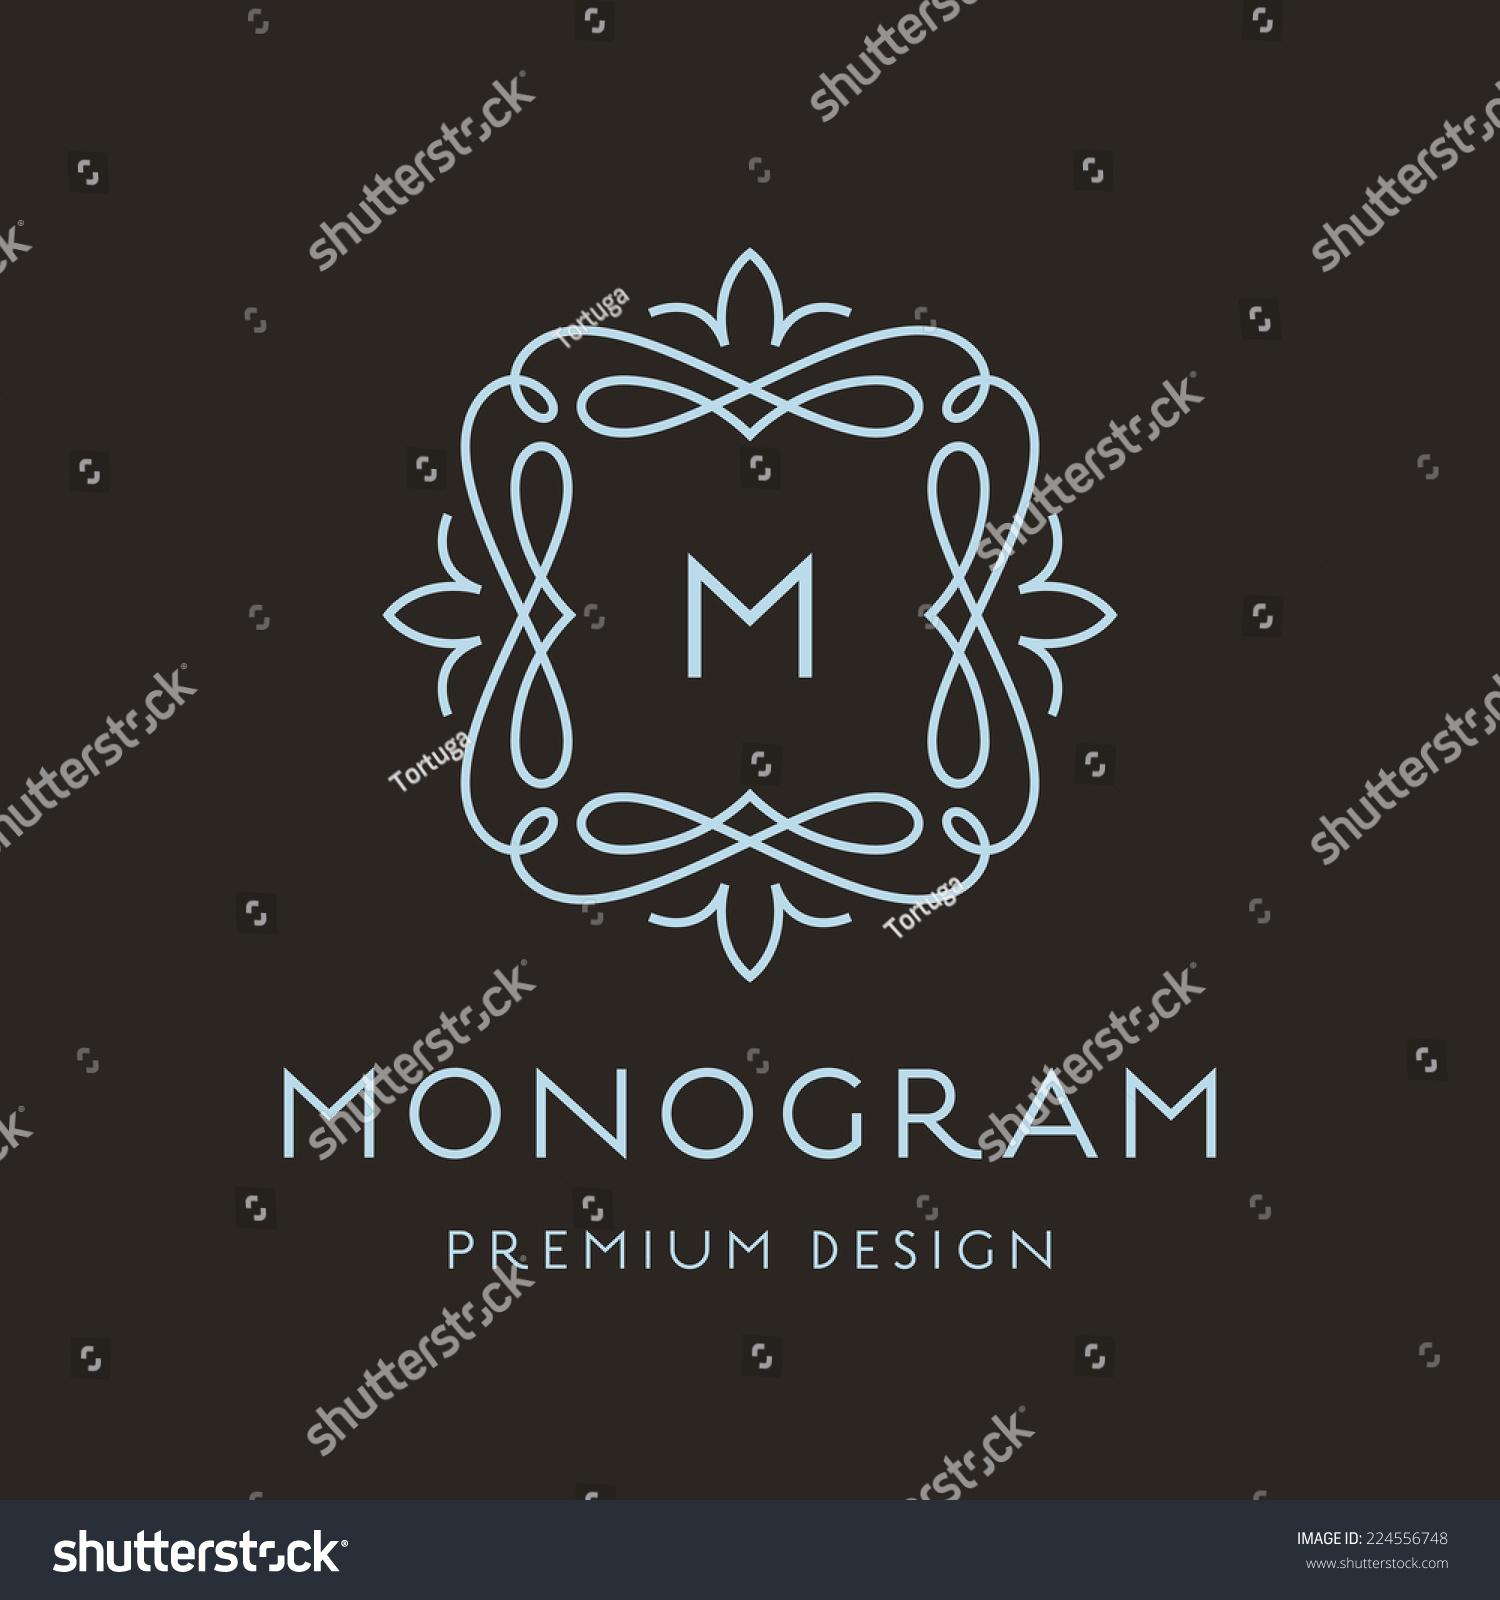 Simple Graceful Monogram Design Template Elegant Stock Photo (Photo ...